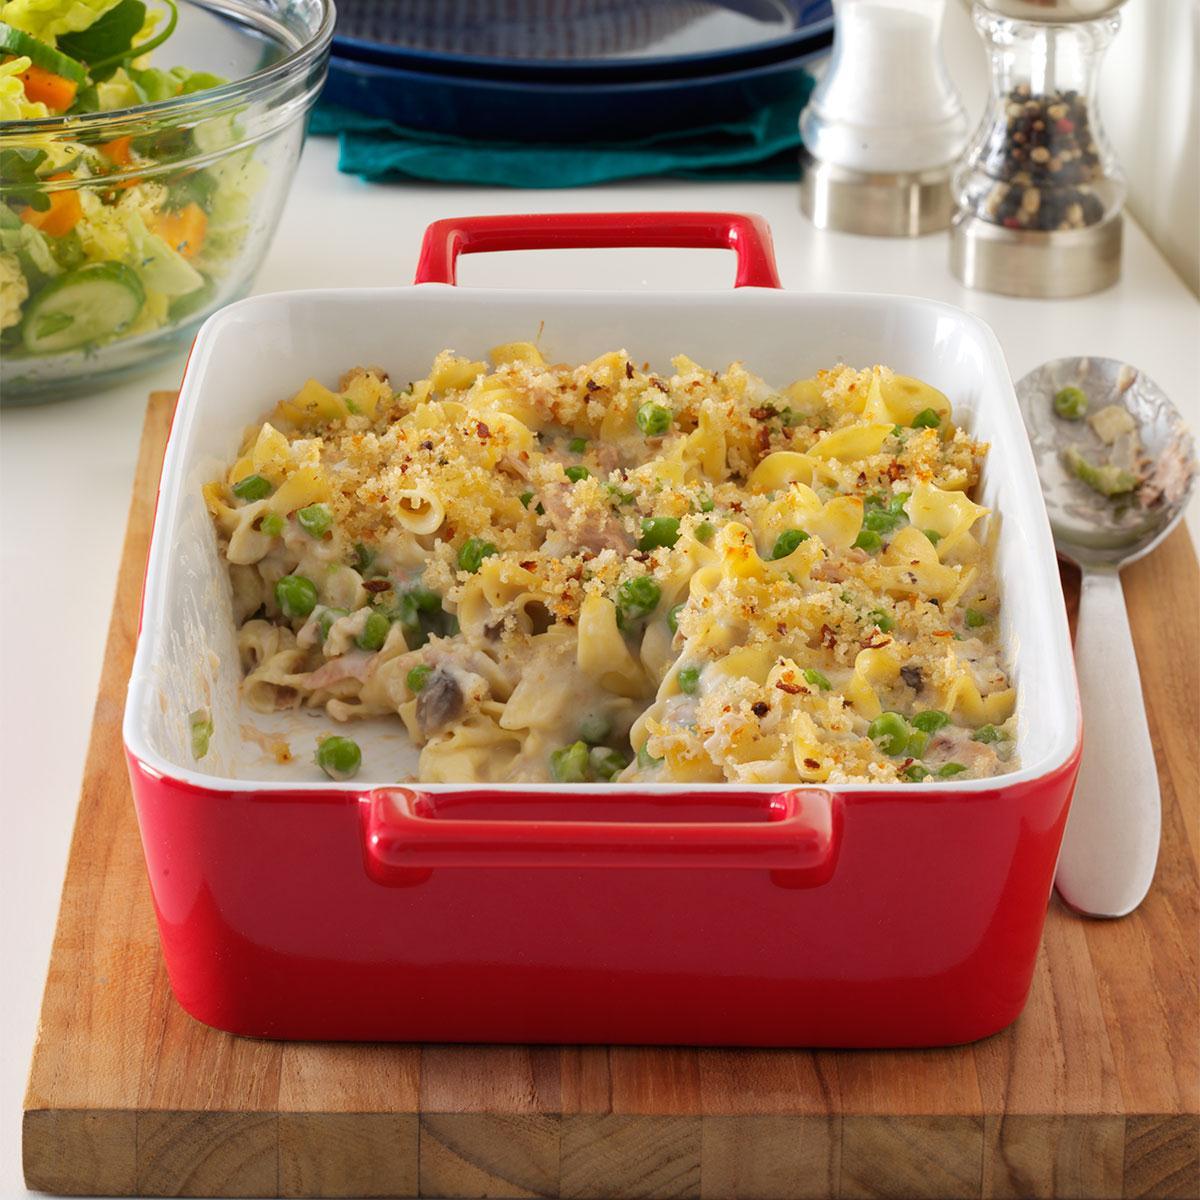 Creamy Tuna Noodle Casserole Recipe How To Make It Taste Of Home